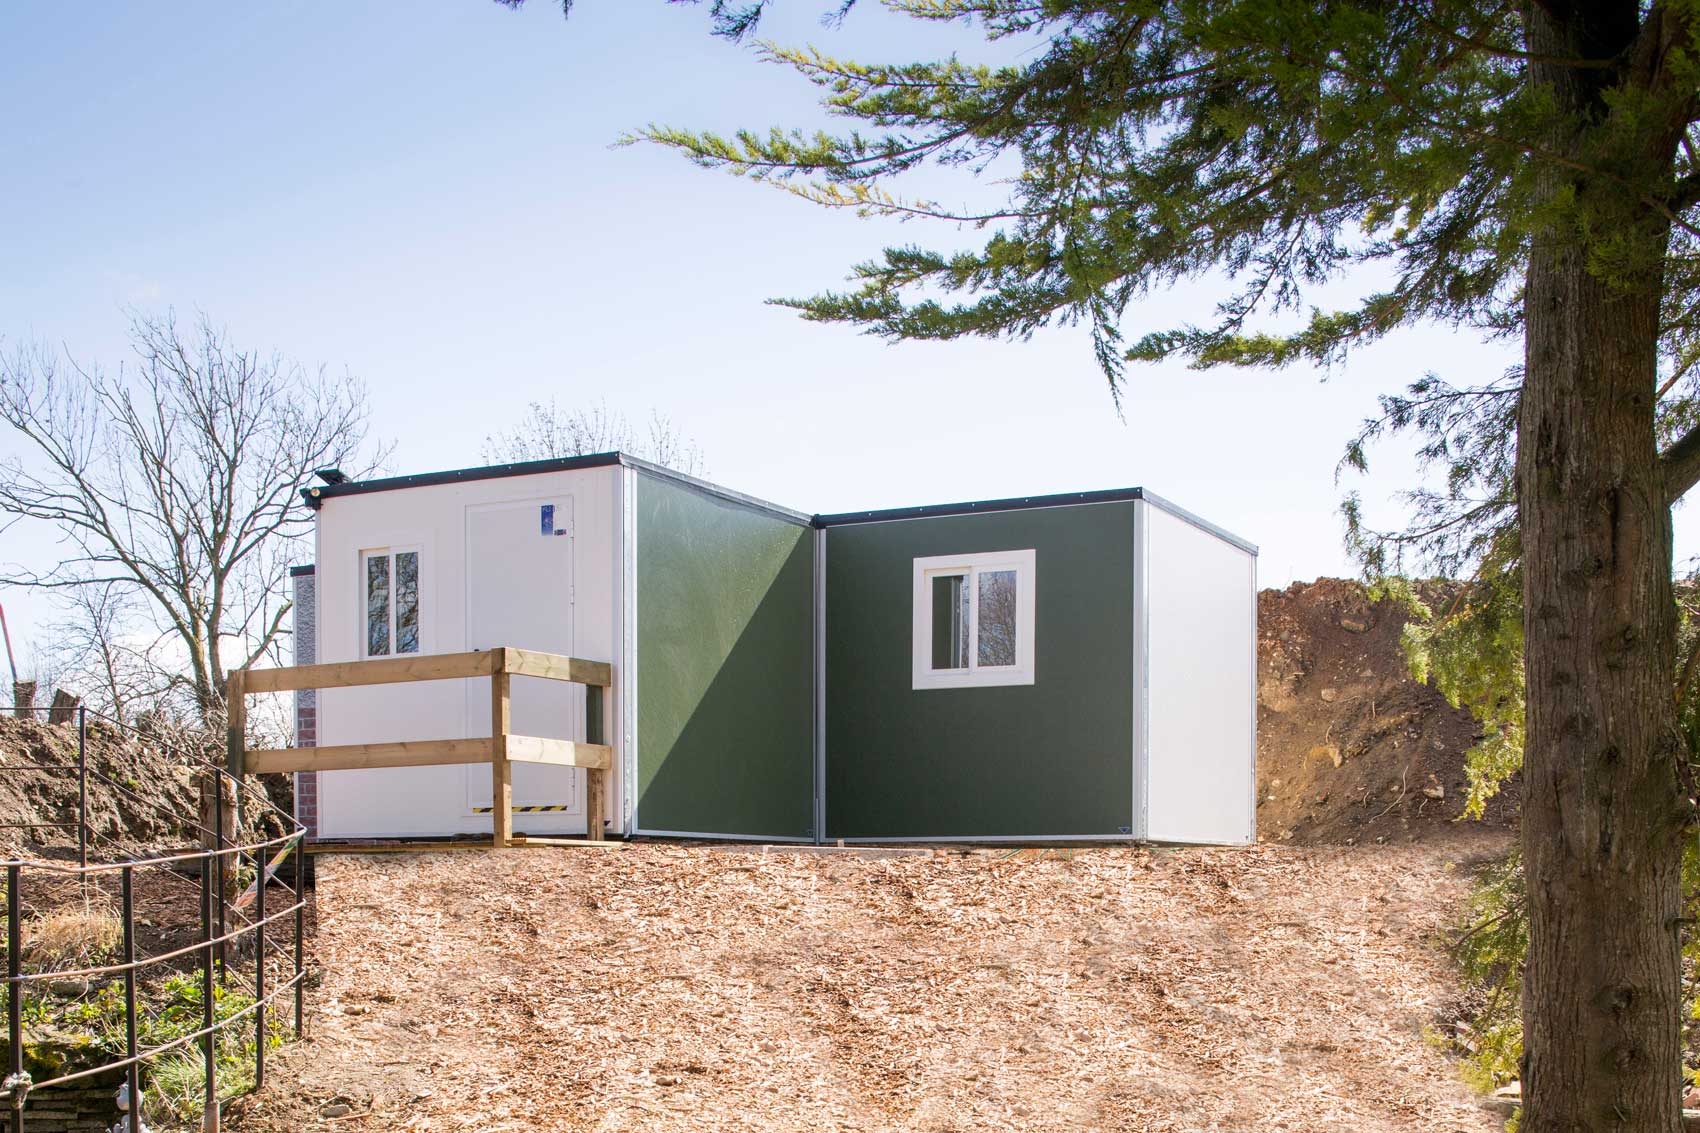 Cocoon Project Kudos Modular Housing 14.jpg